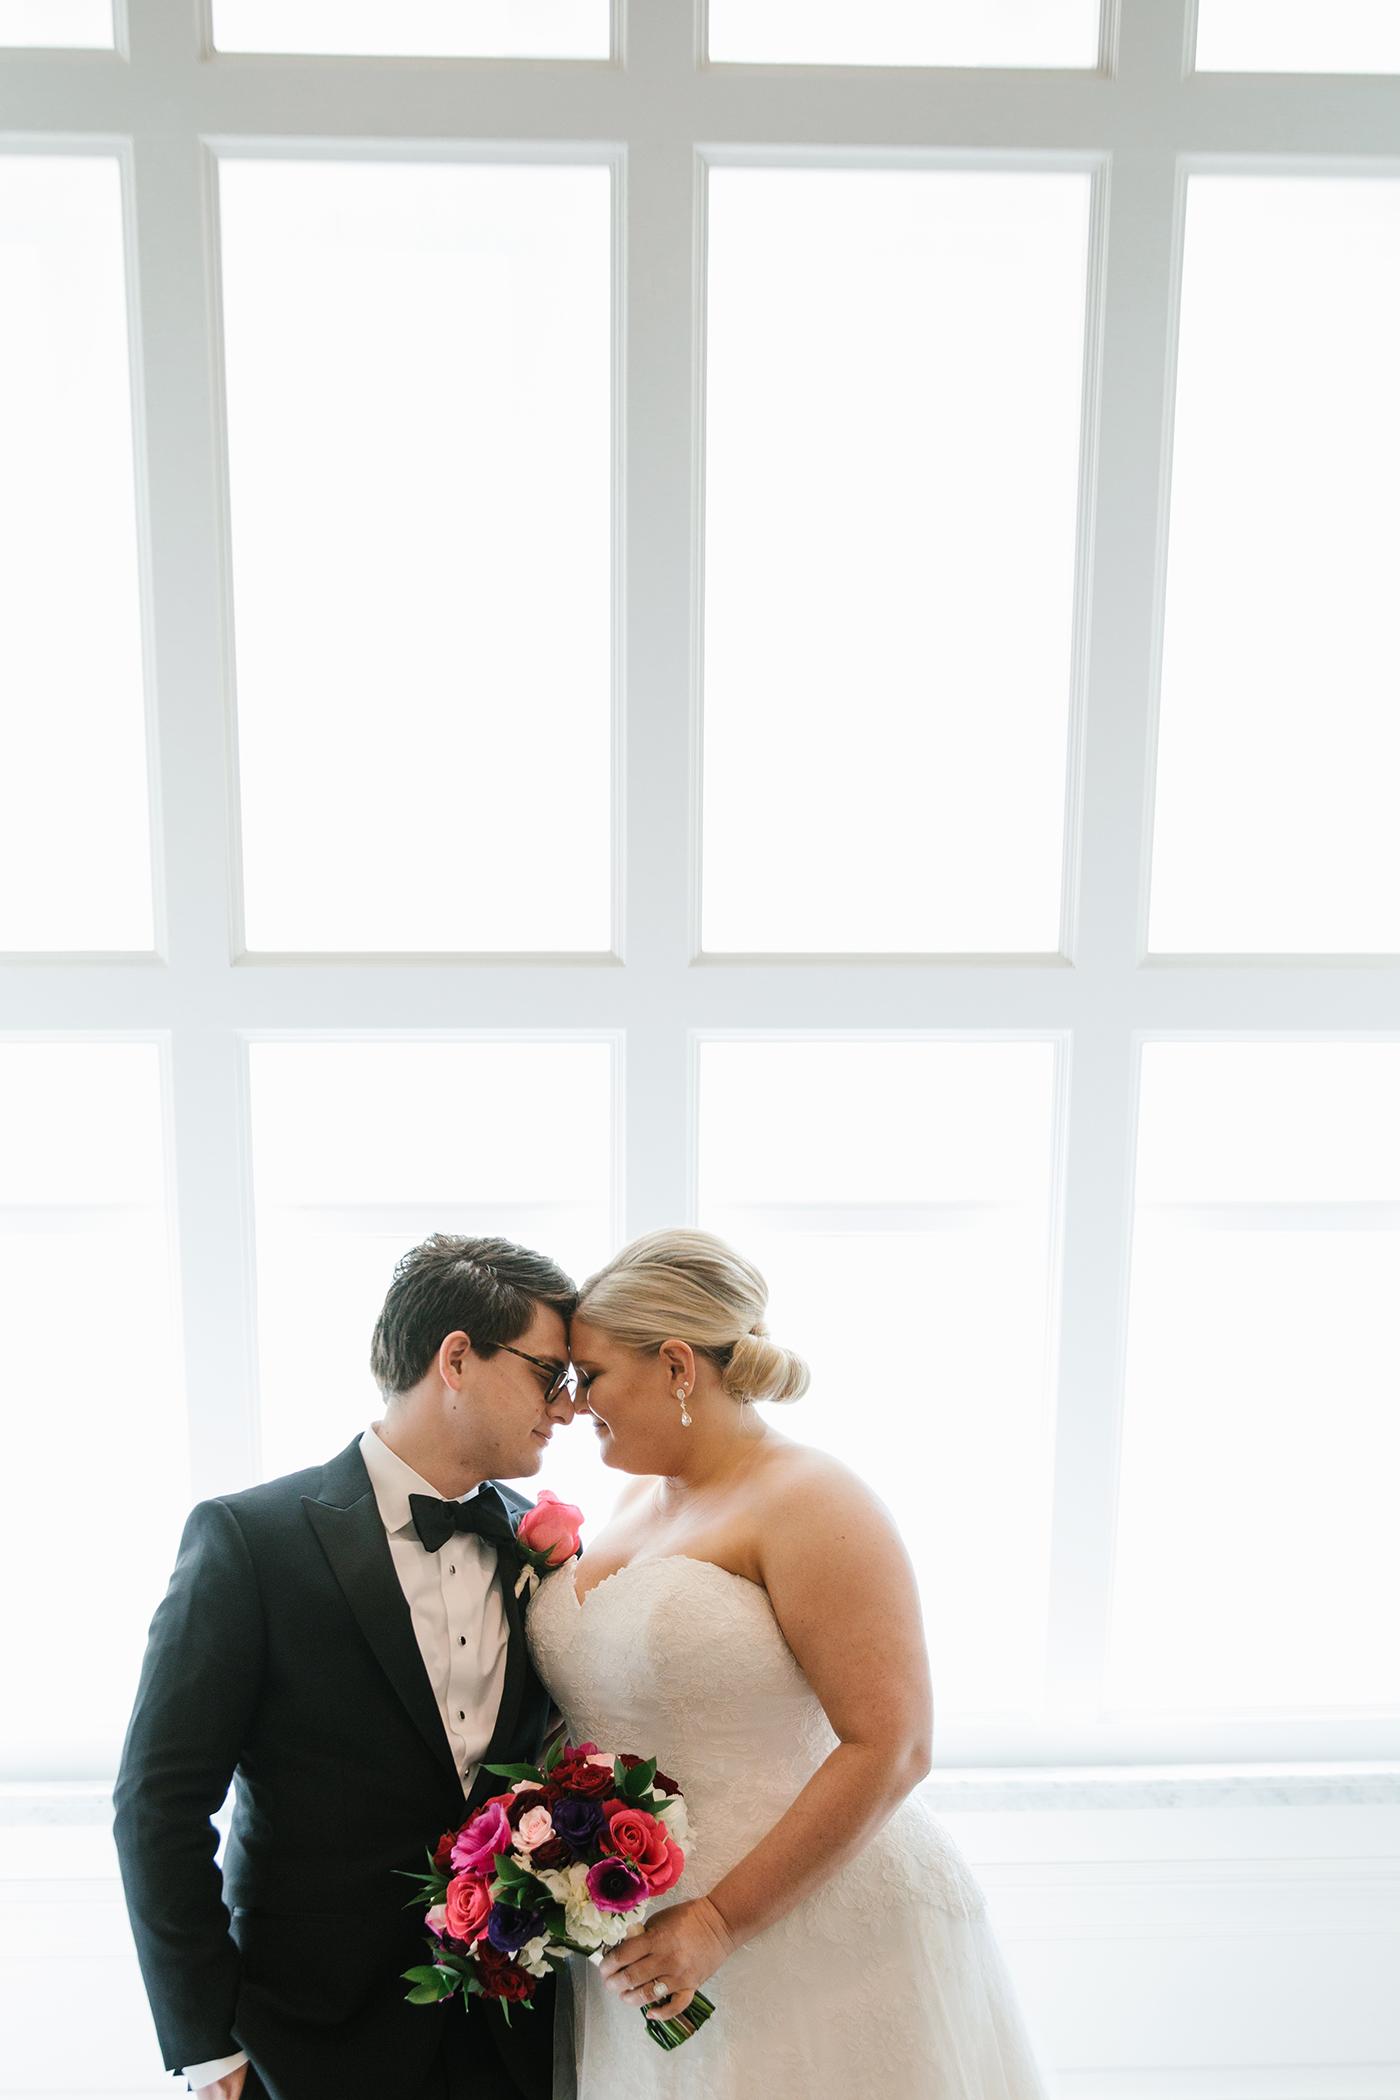 Dallas Weddings Planner - Allday Events - Katie + Matthew at The Adolphus Hotel - 188.jpg